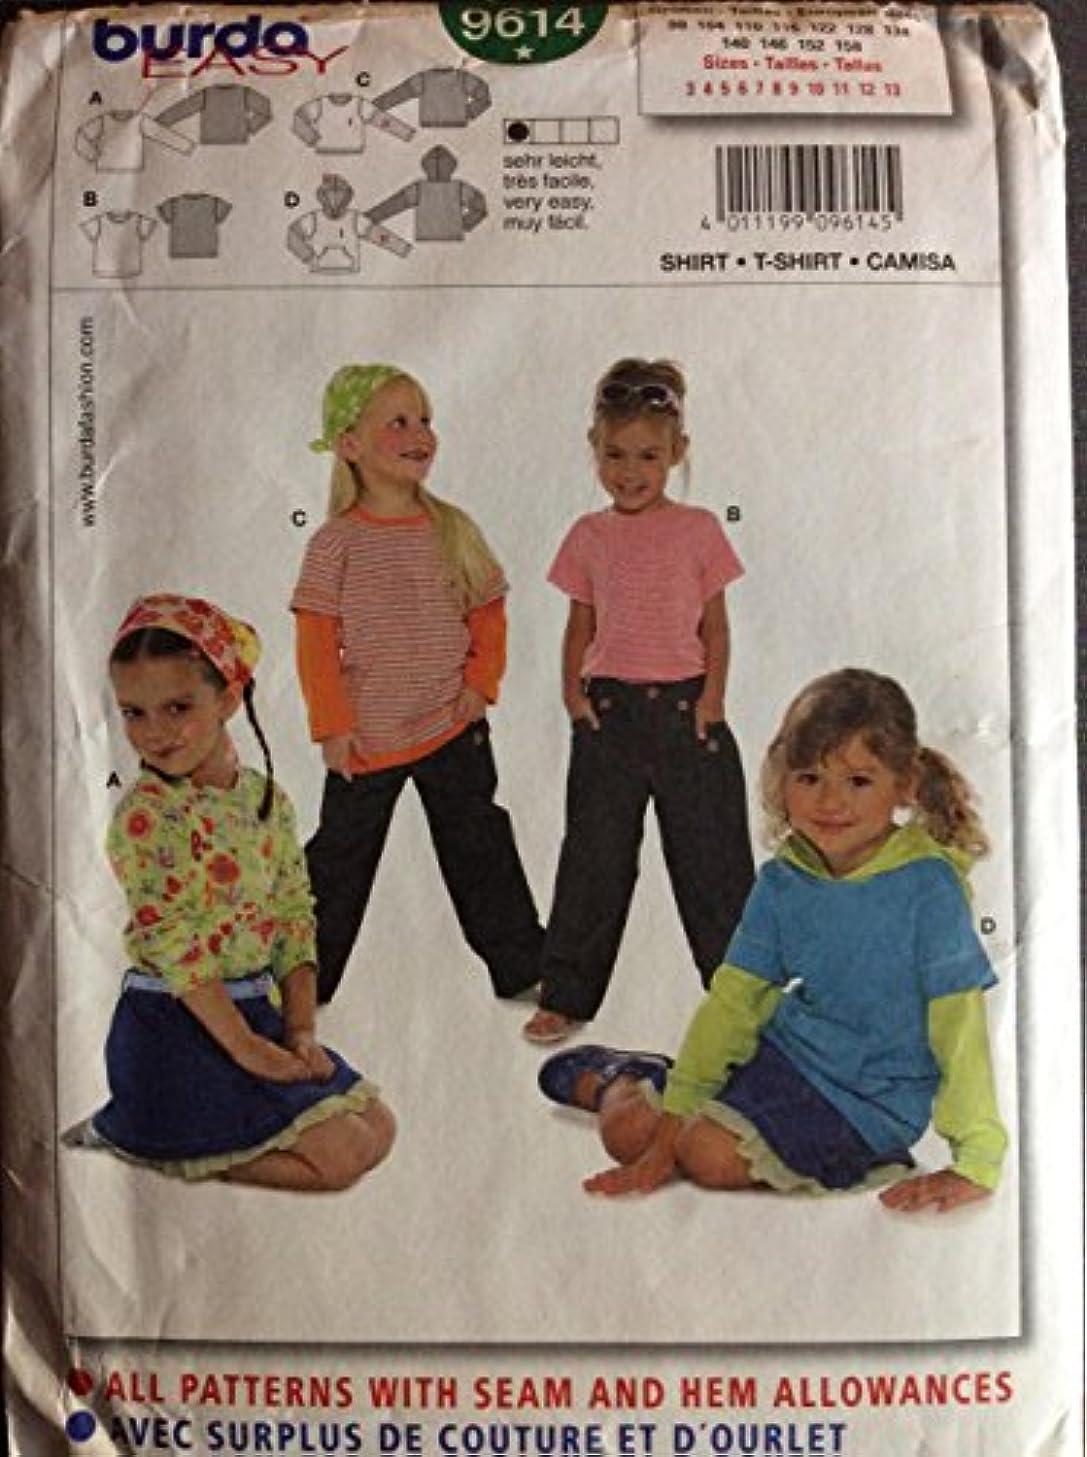 Burda Easy 9614 Girls Pattern Top and Hooded Shirt sizes 3-13